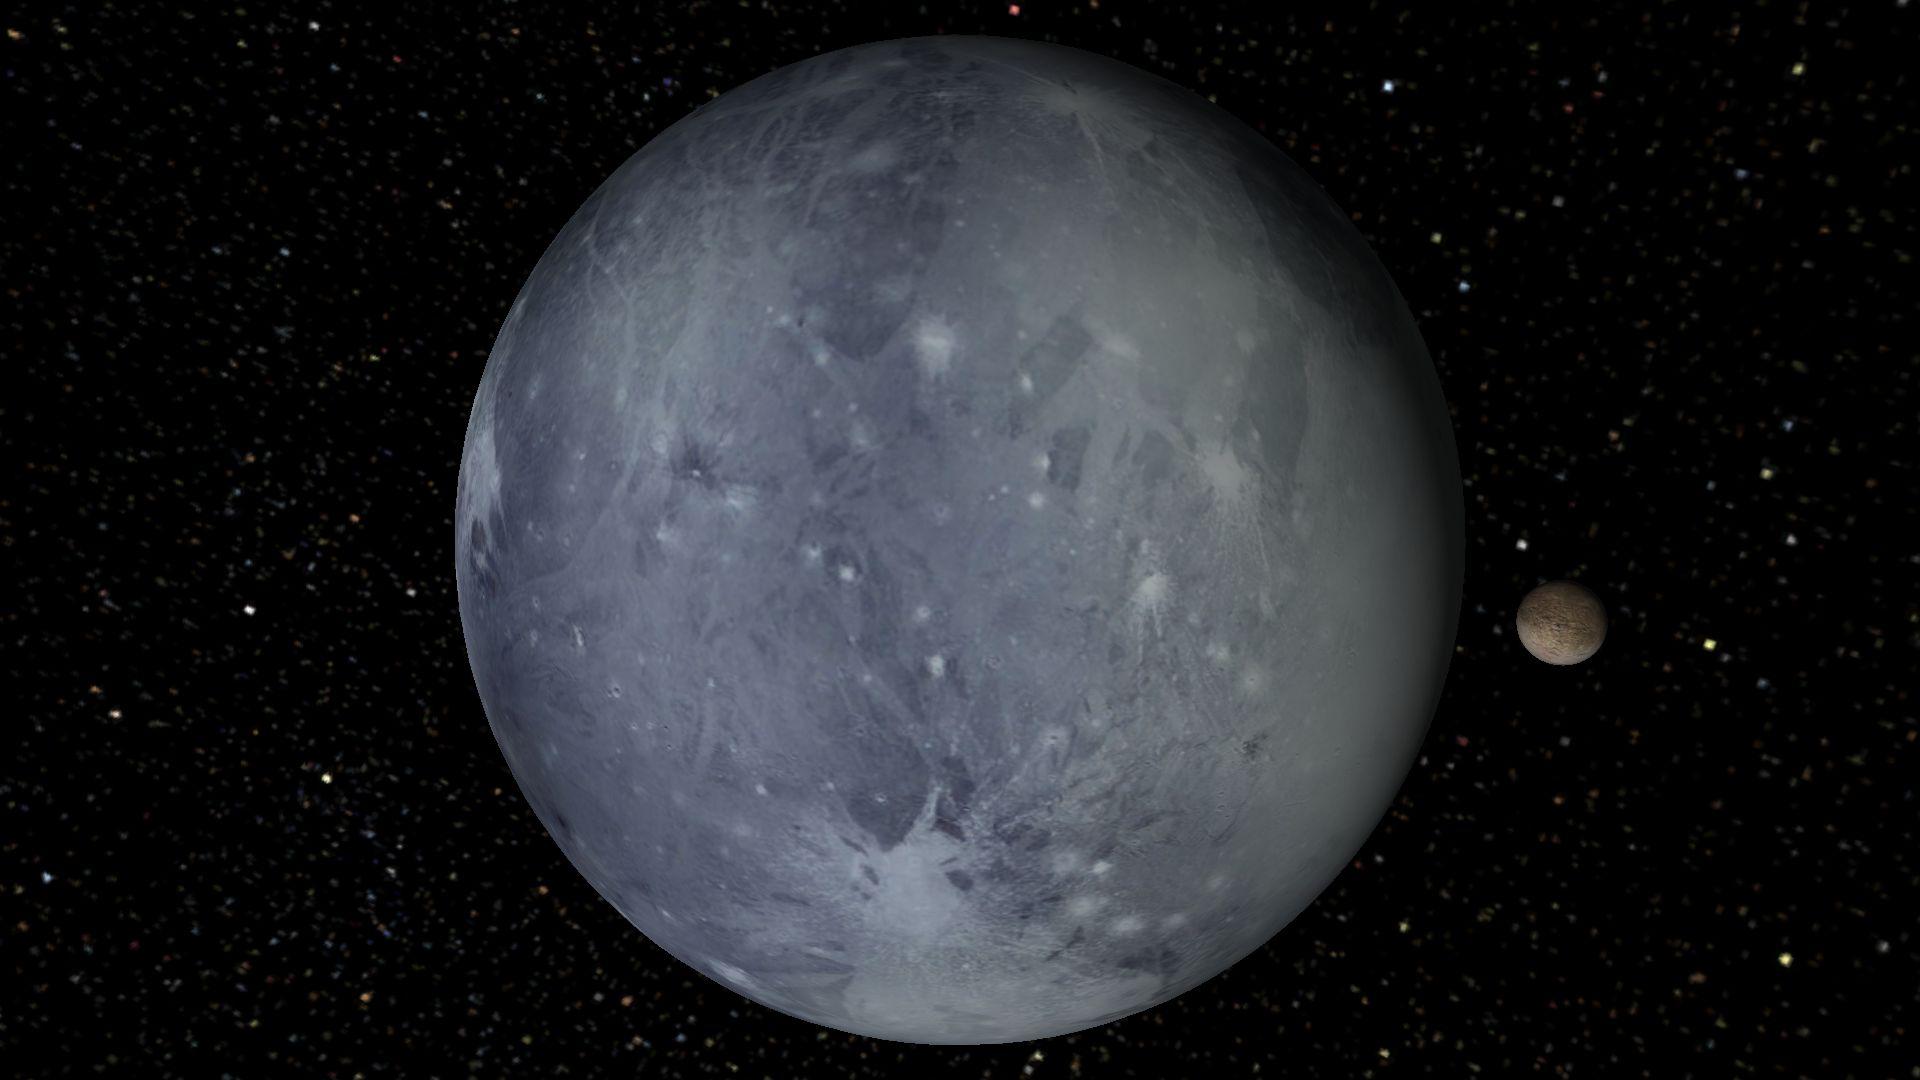 pluto planet size - photo #21